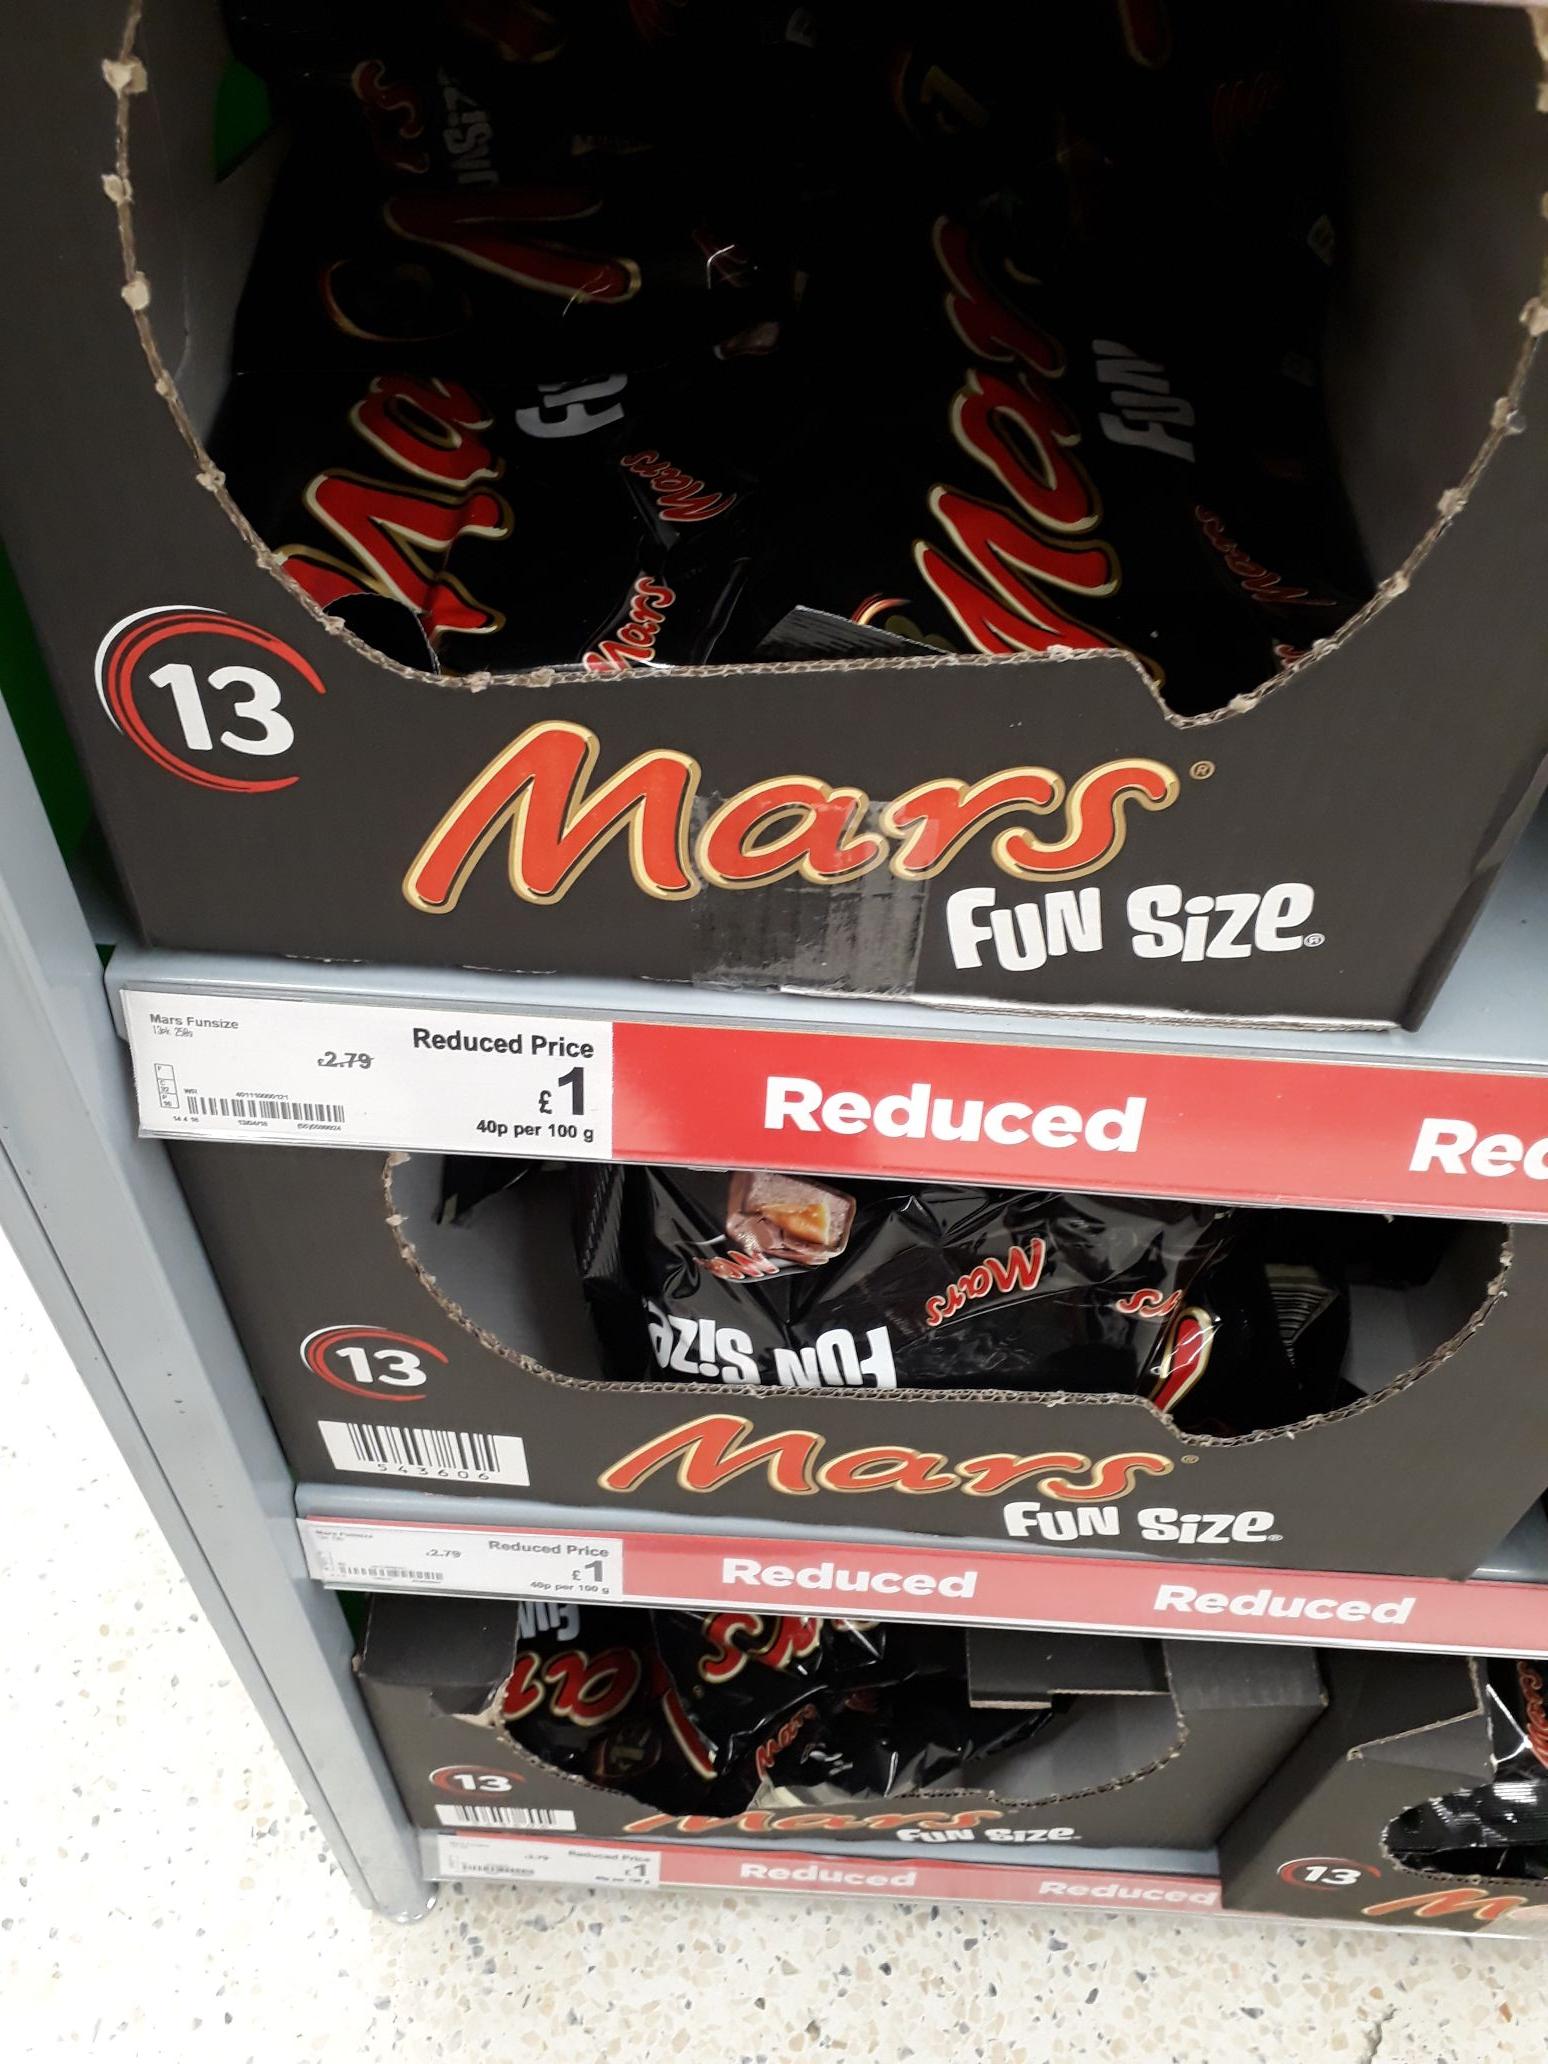 13 mini mars ...Asda £1